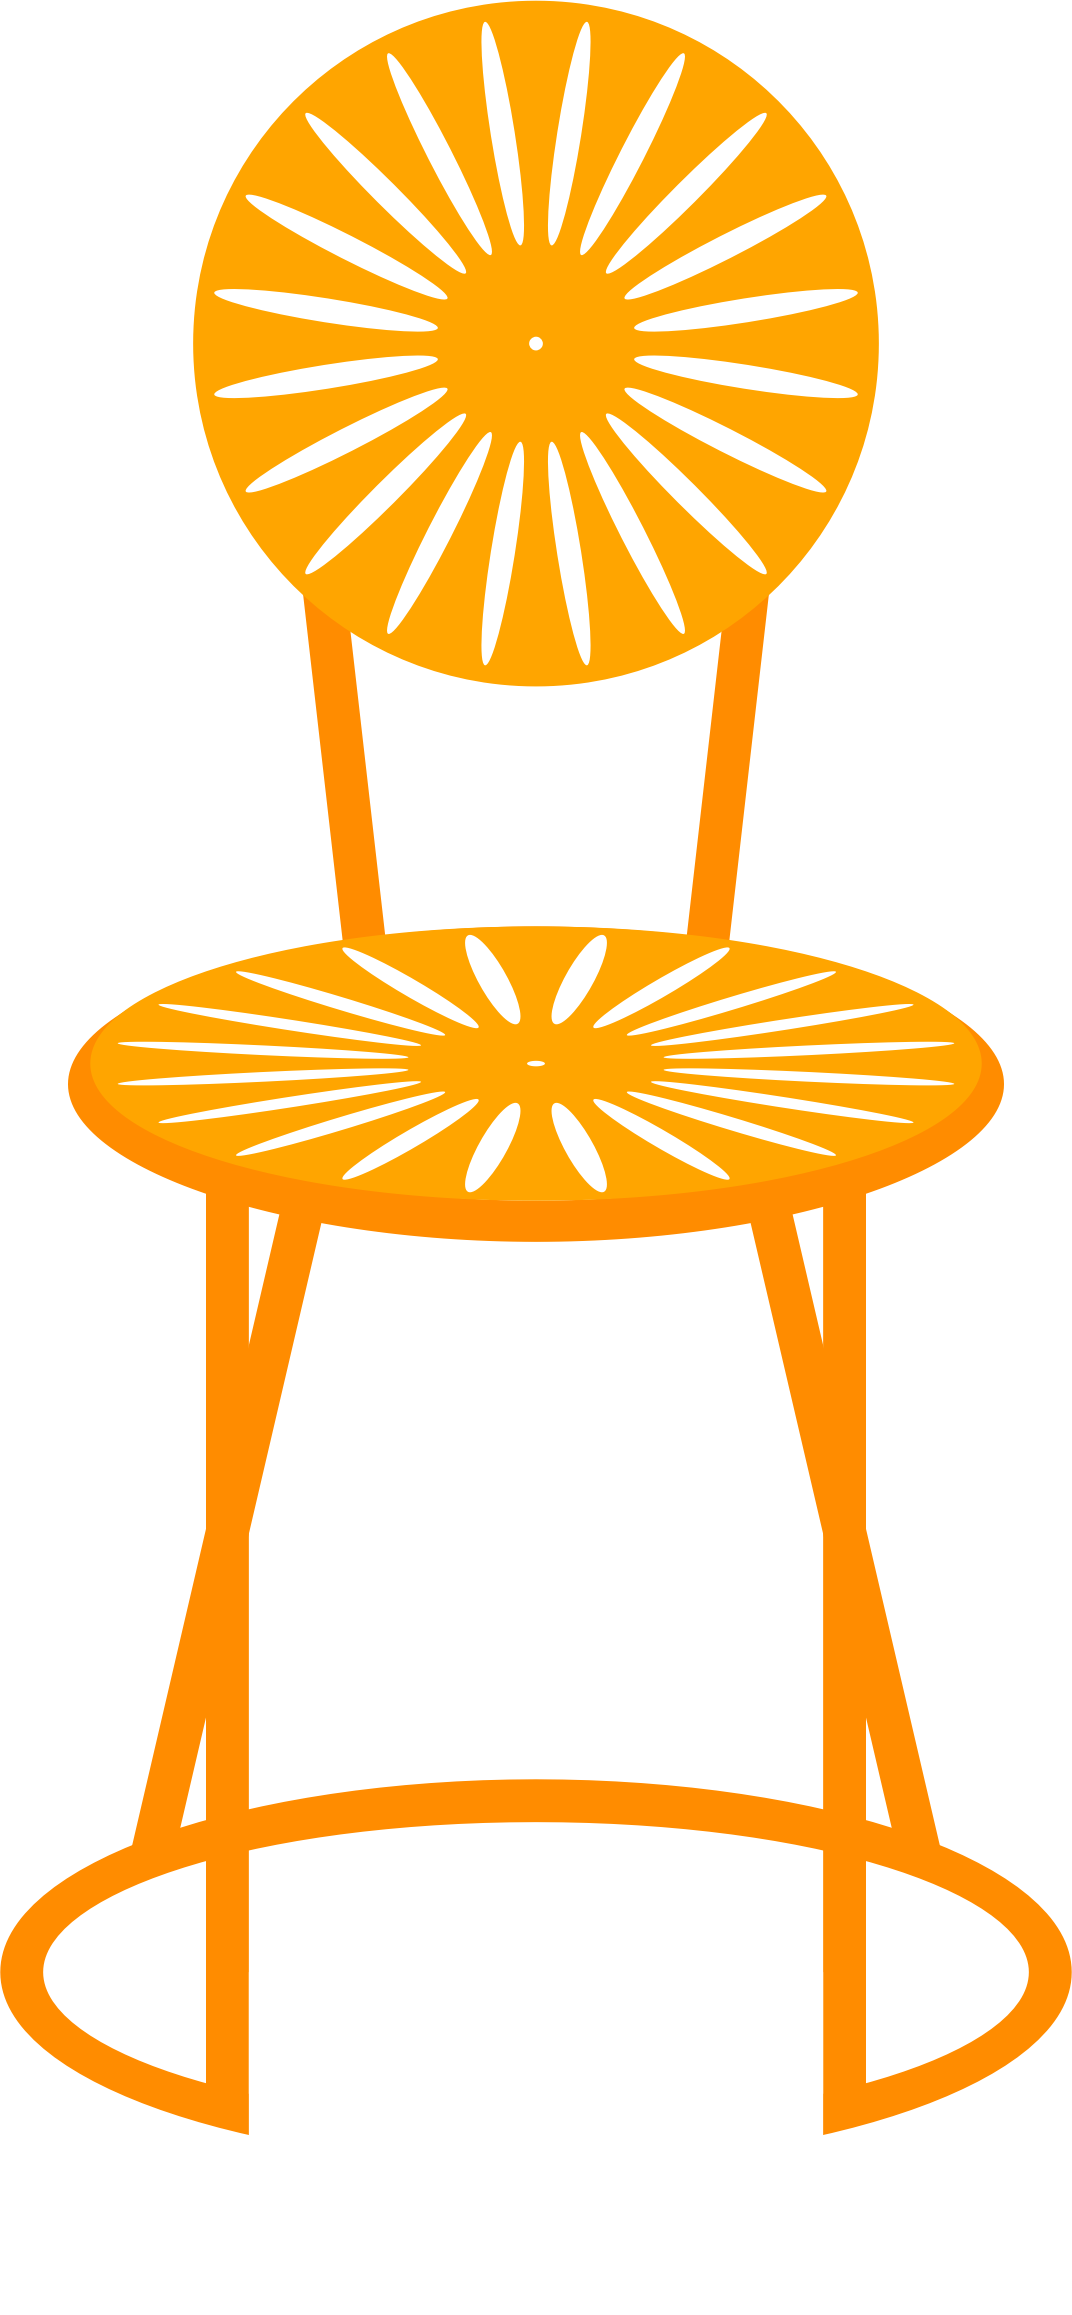 Sunburst big image png. Clipart chair 3 chair